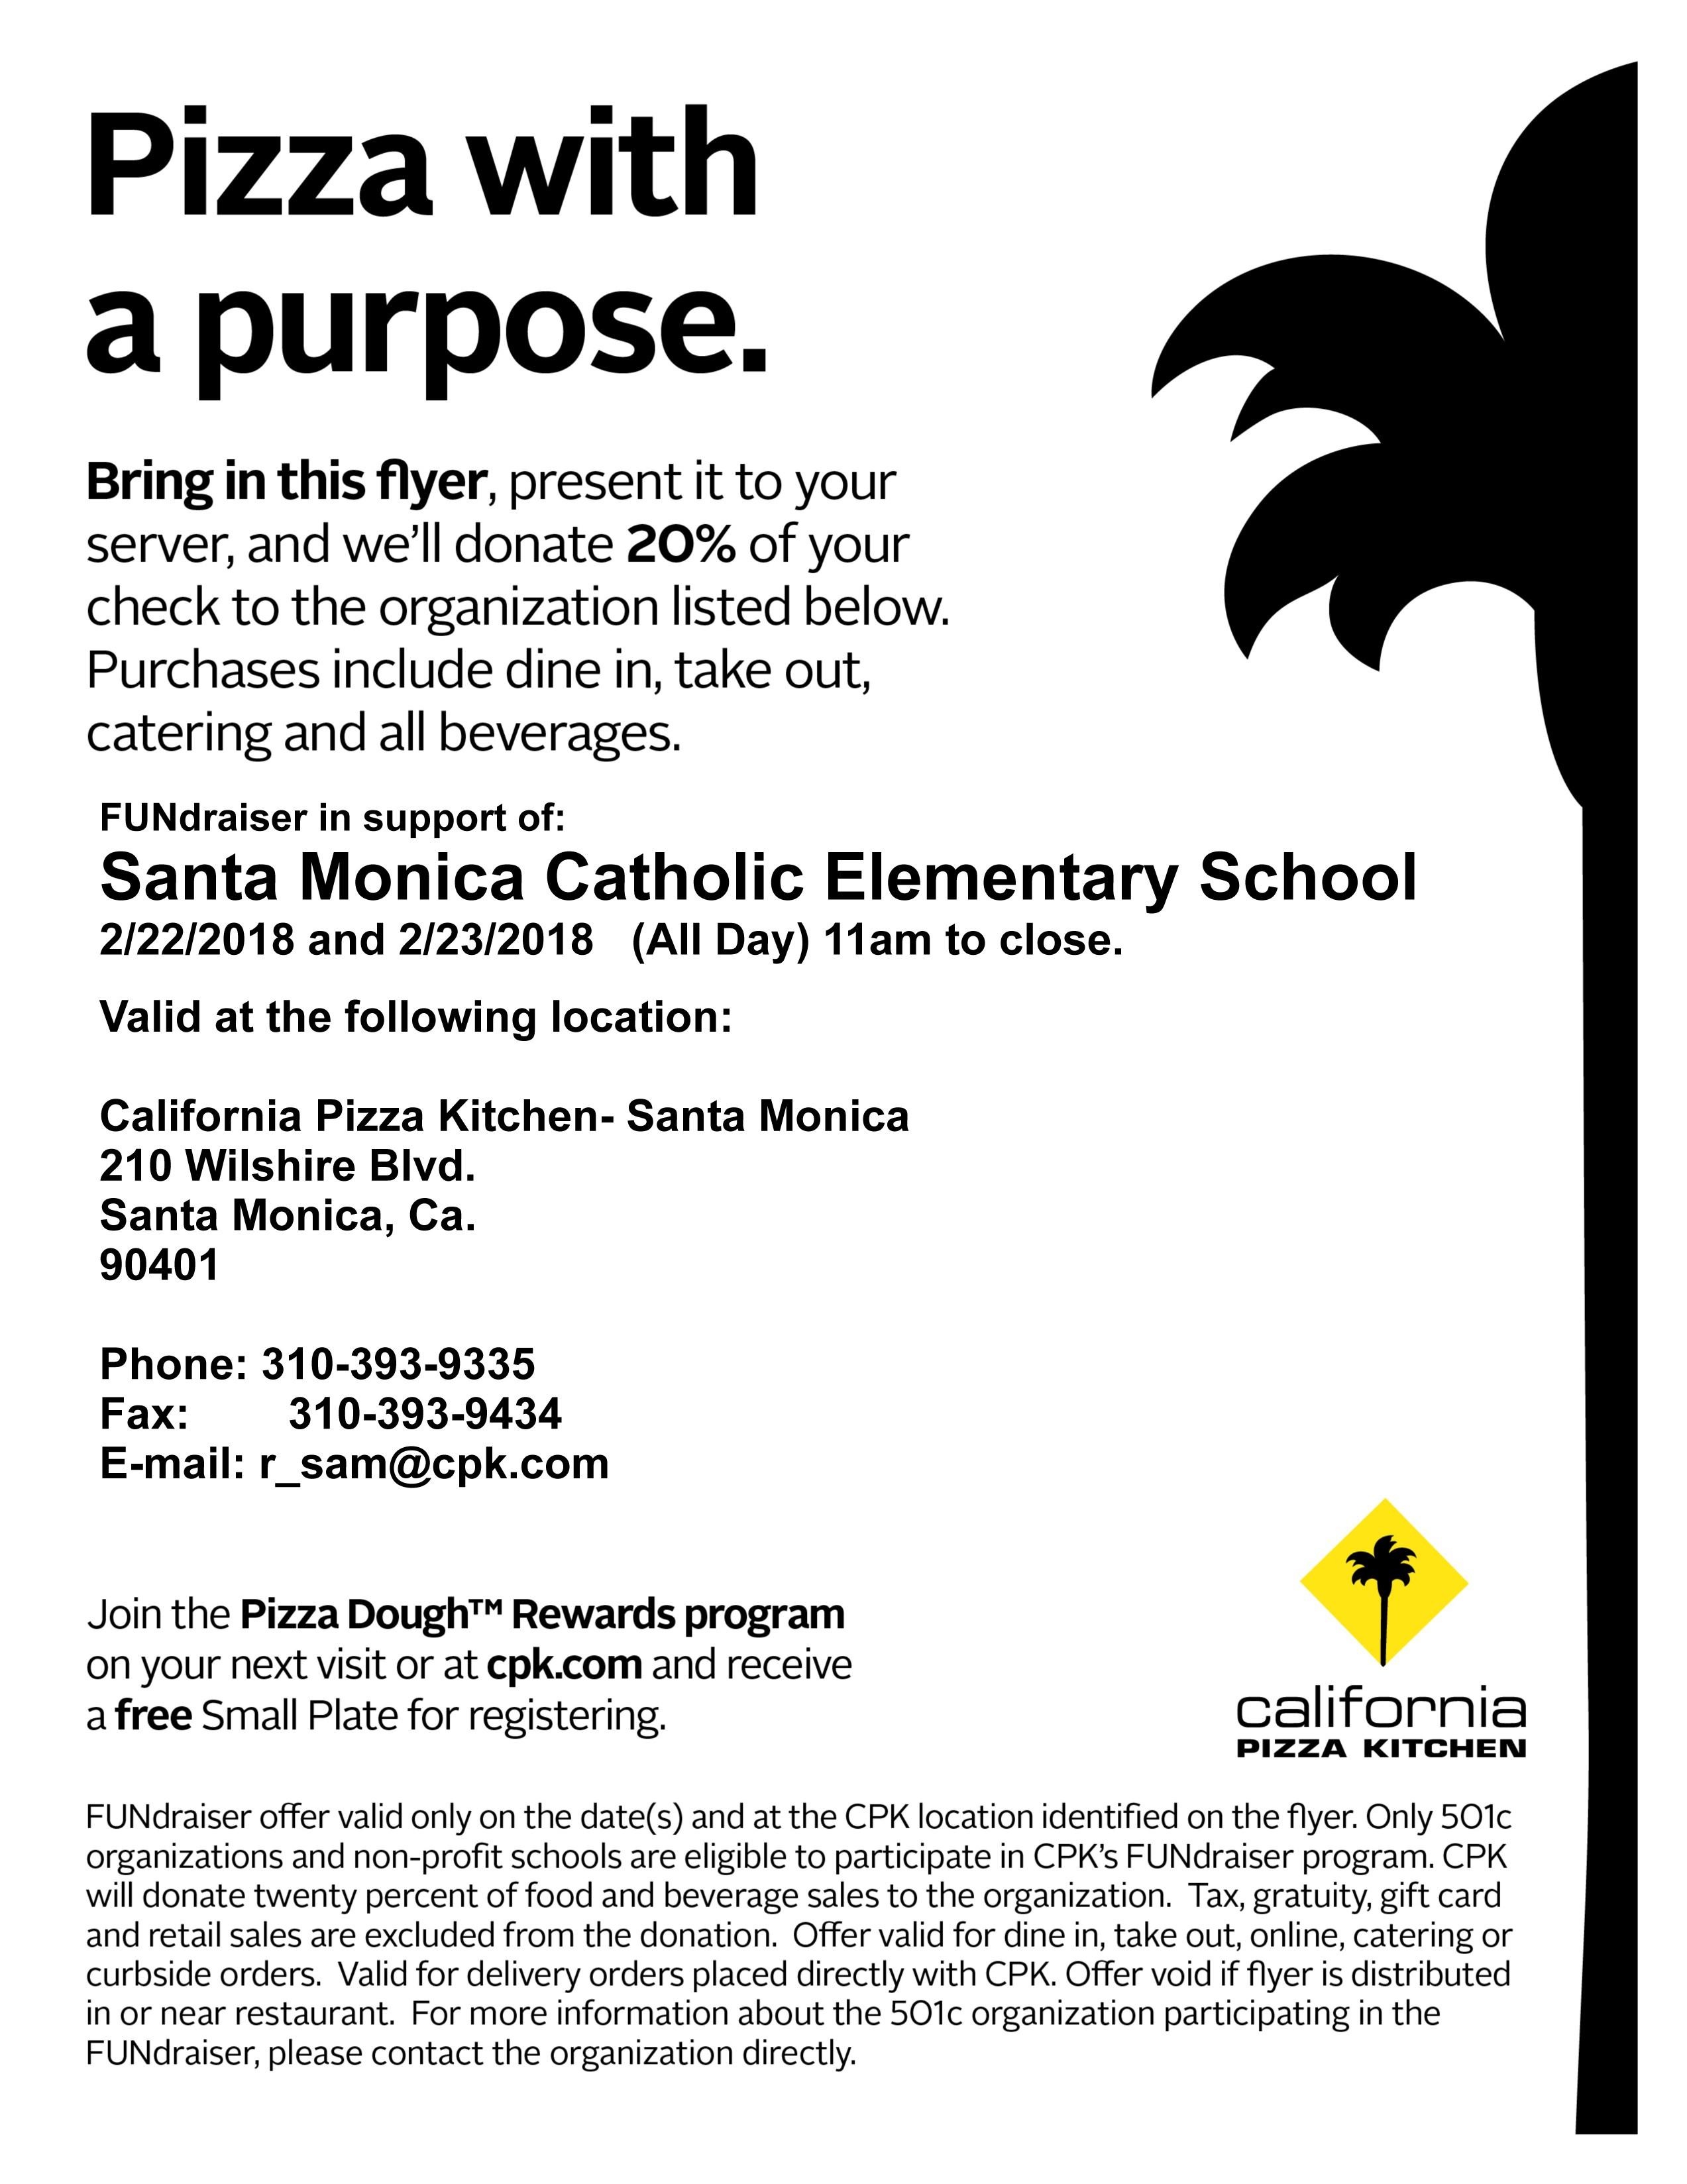 St. Monica Catholic Elementary School